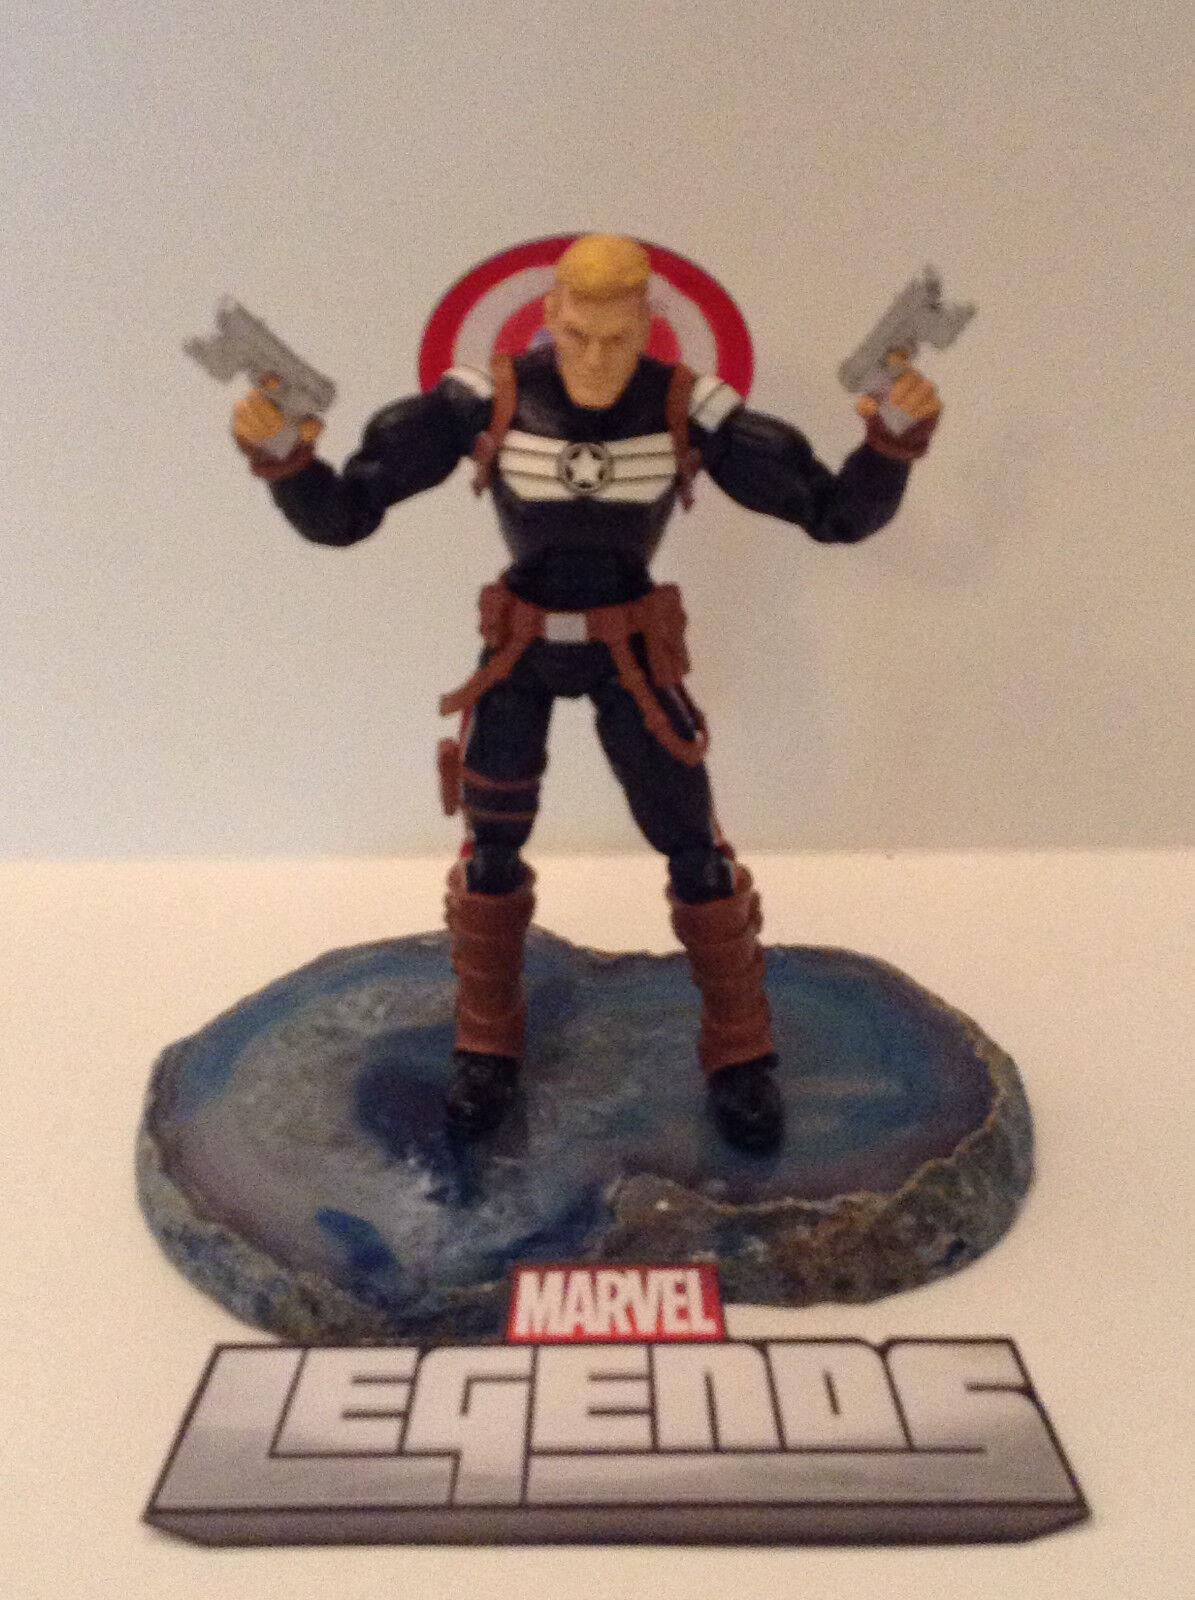 Marvel - legenden - 041 - steve rodgers - lose bild - terrax baf variante selten